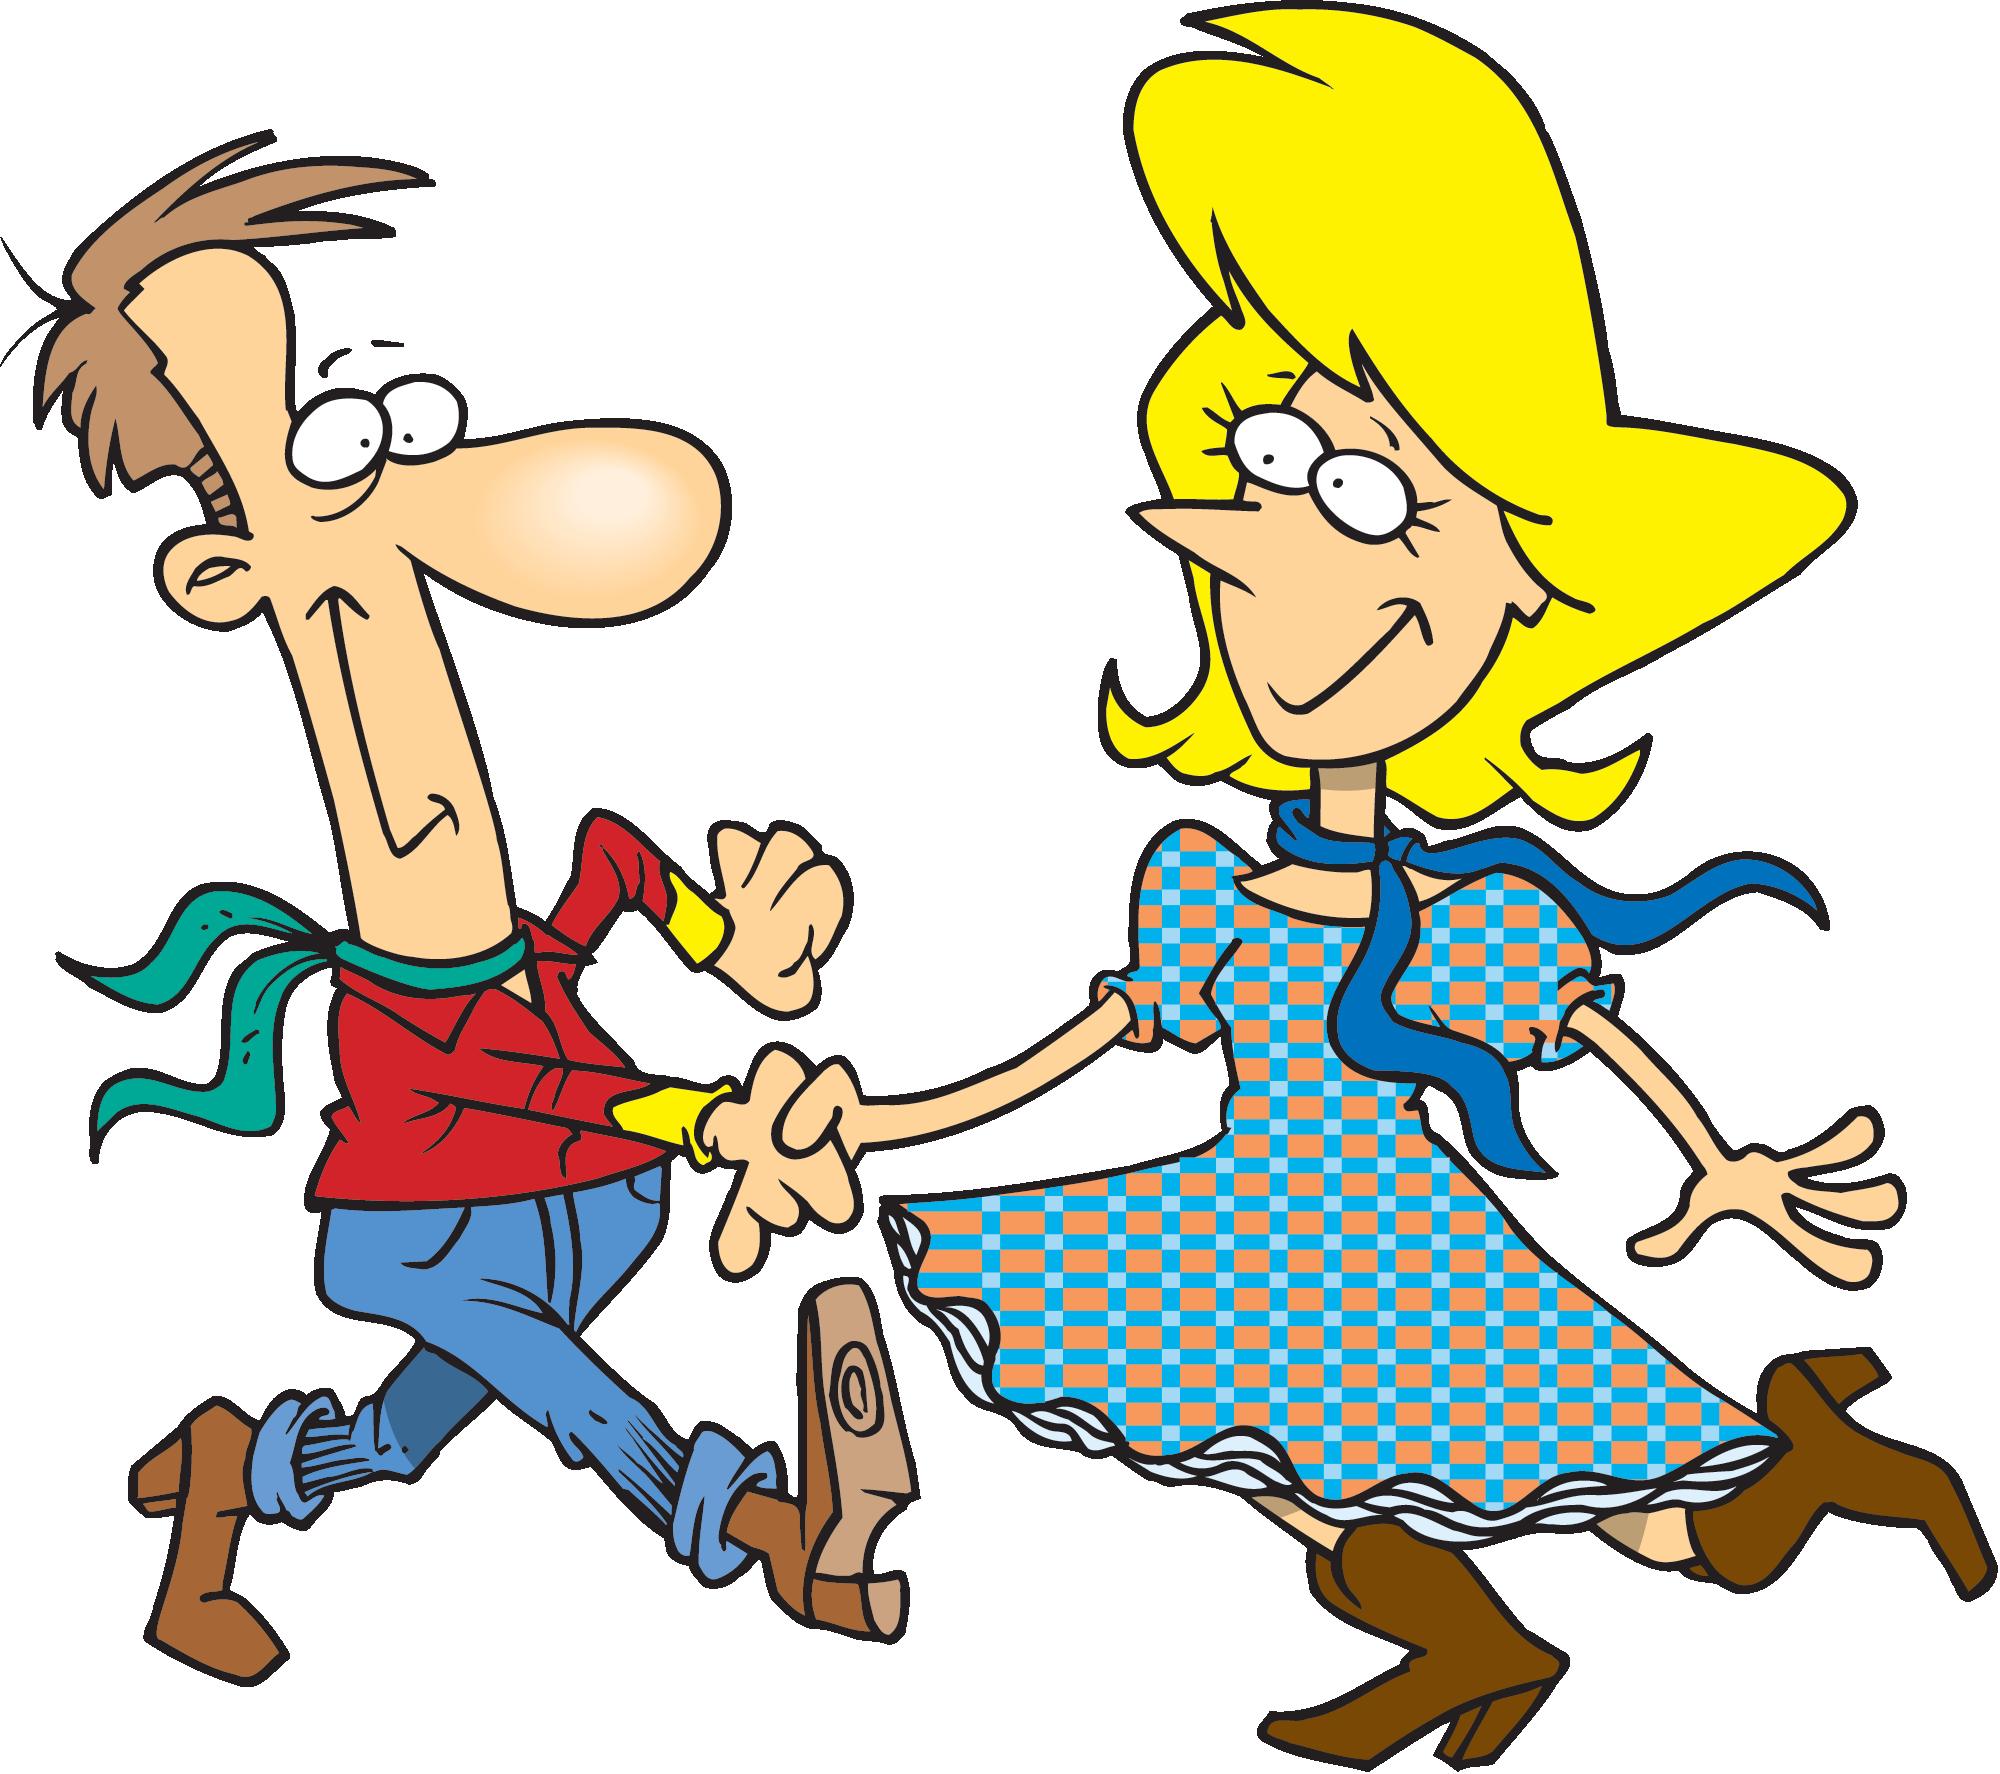 Danse clipart funny dancing Dance Cartoon images Images Cartoon